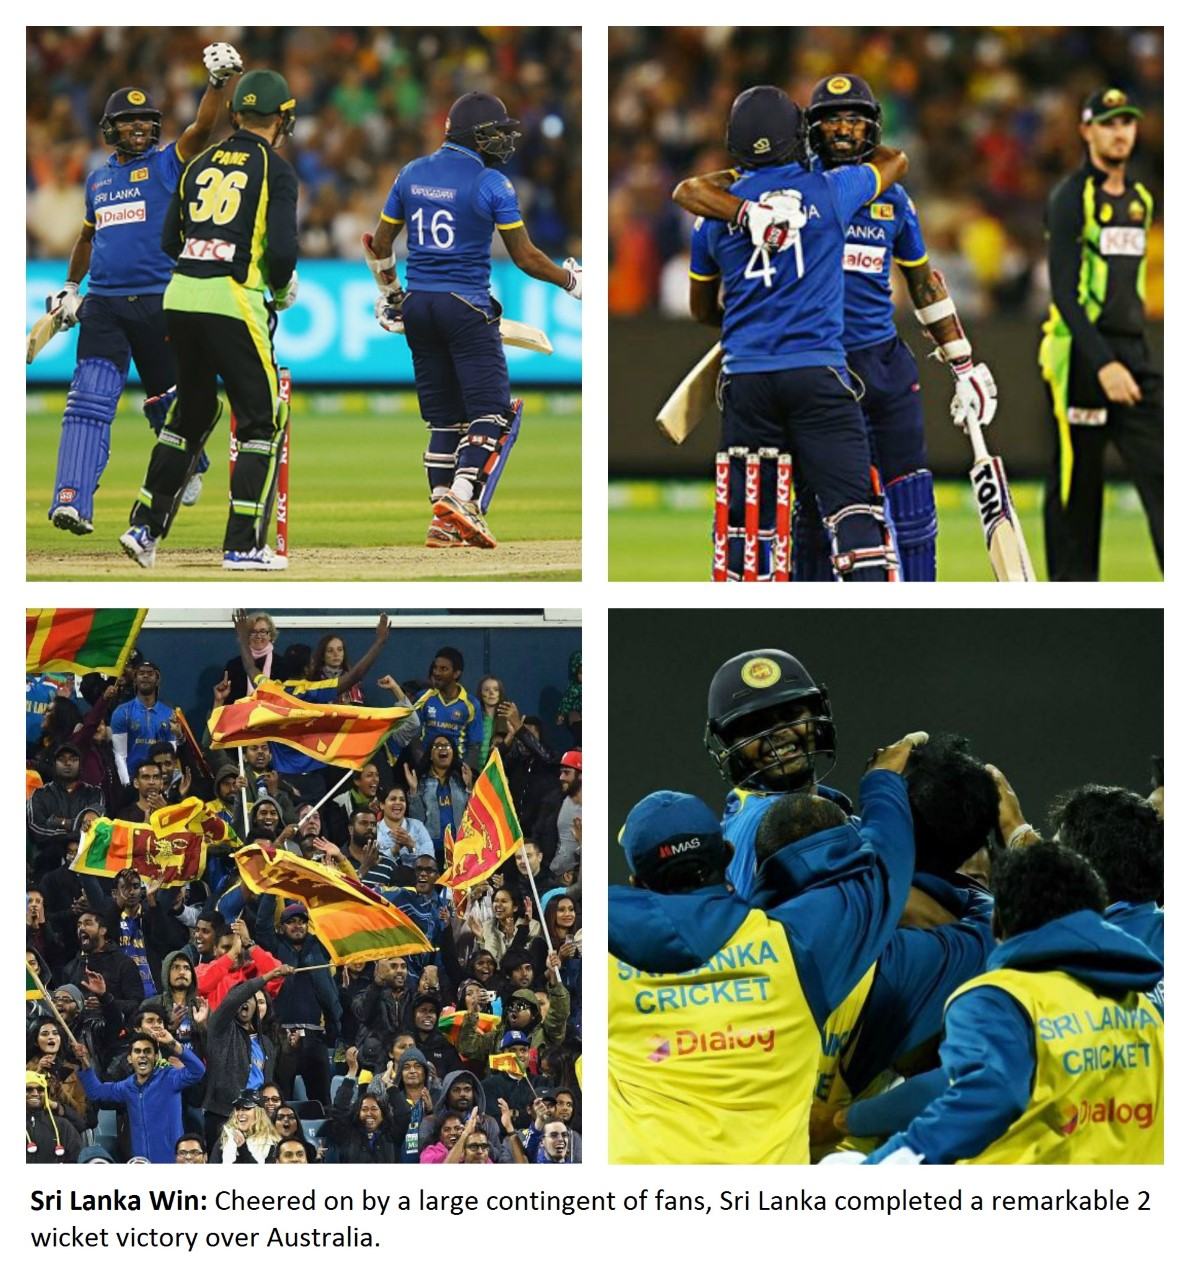 thumbnail_Sri Lanka Win.jpg